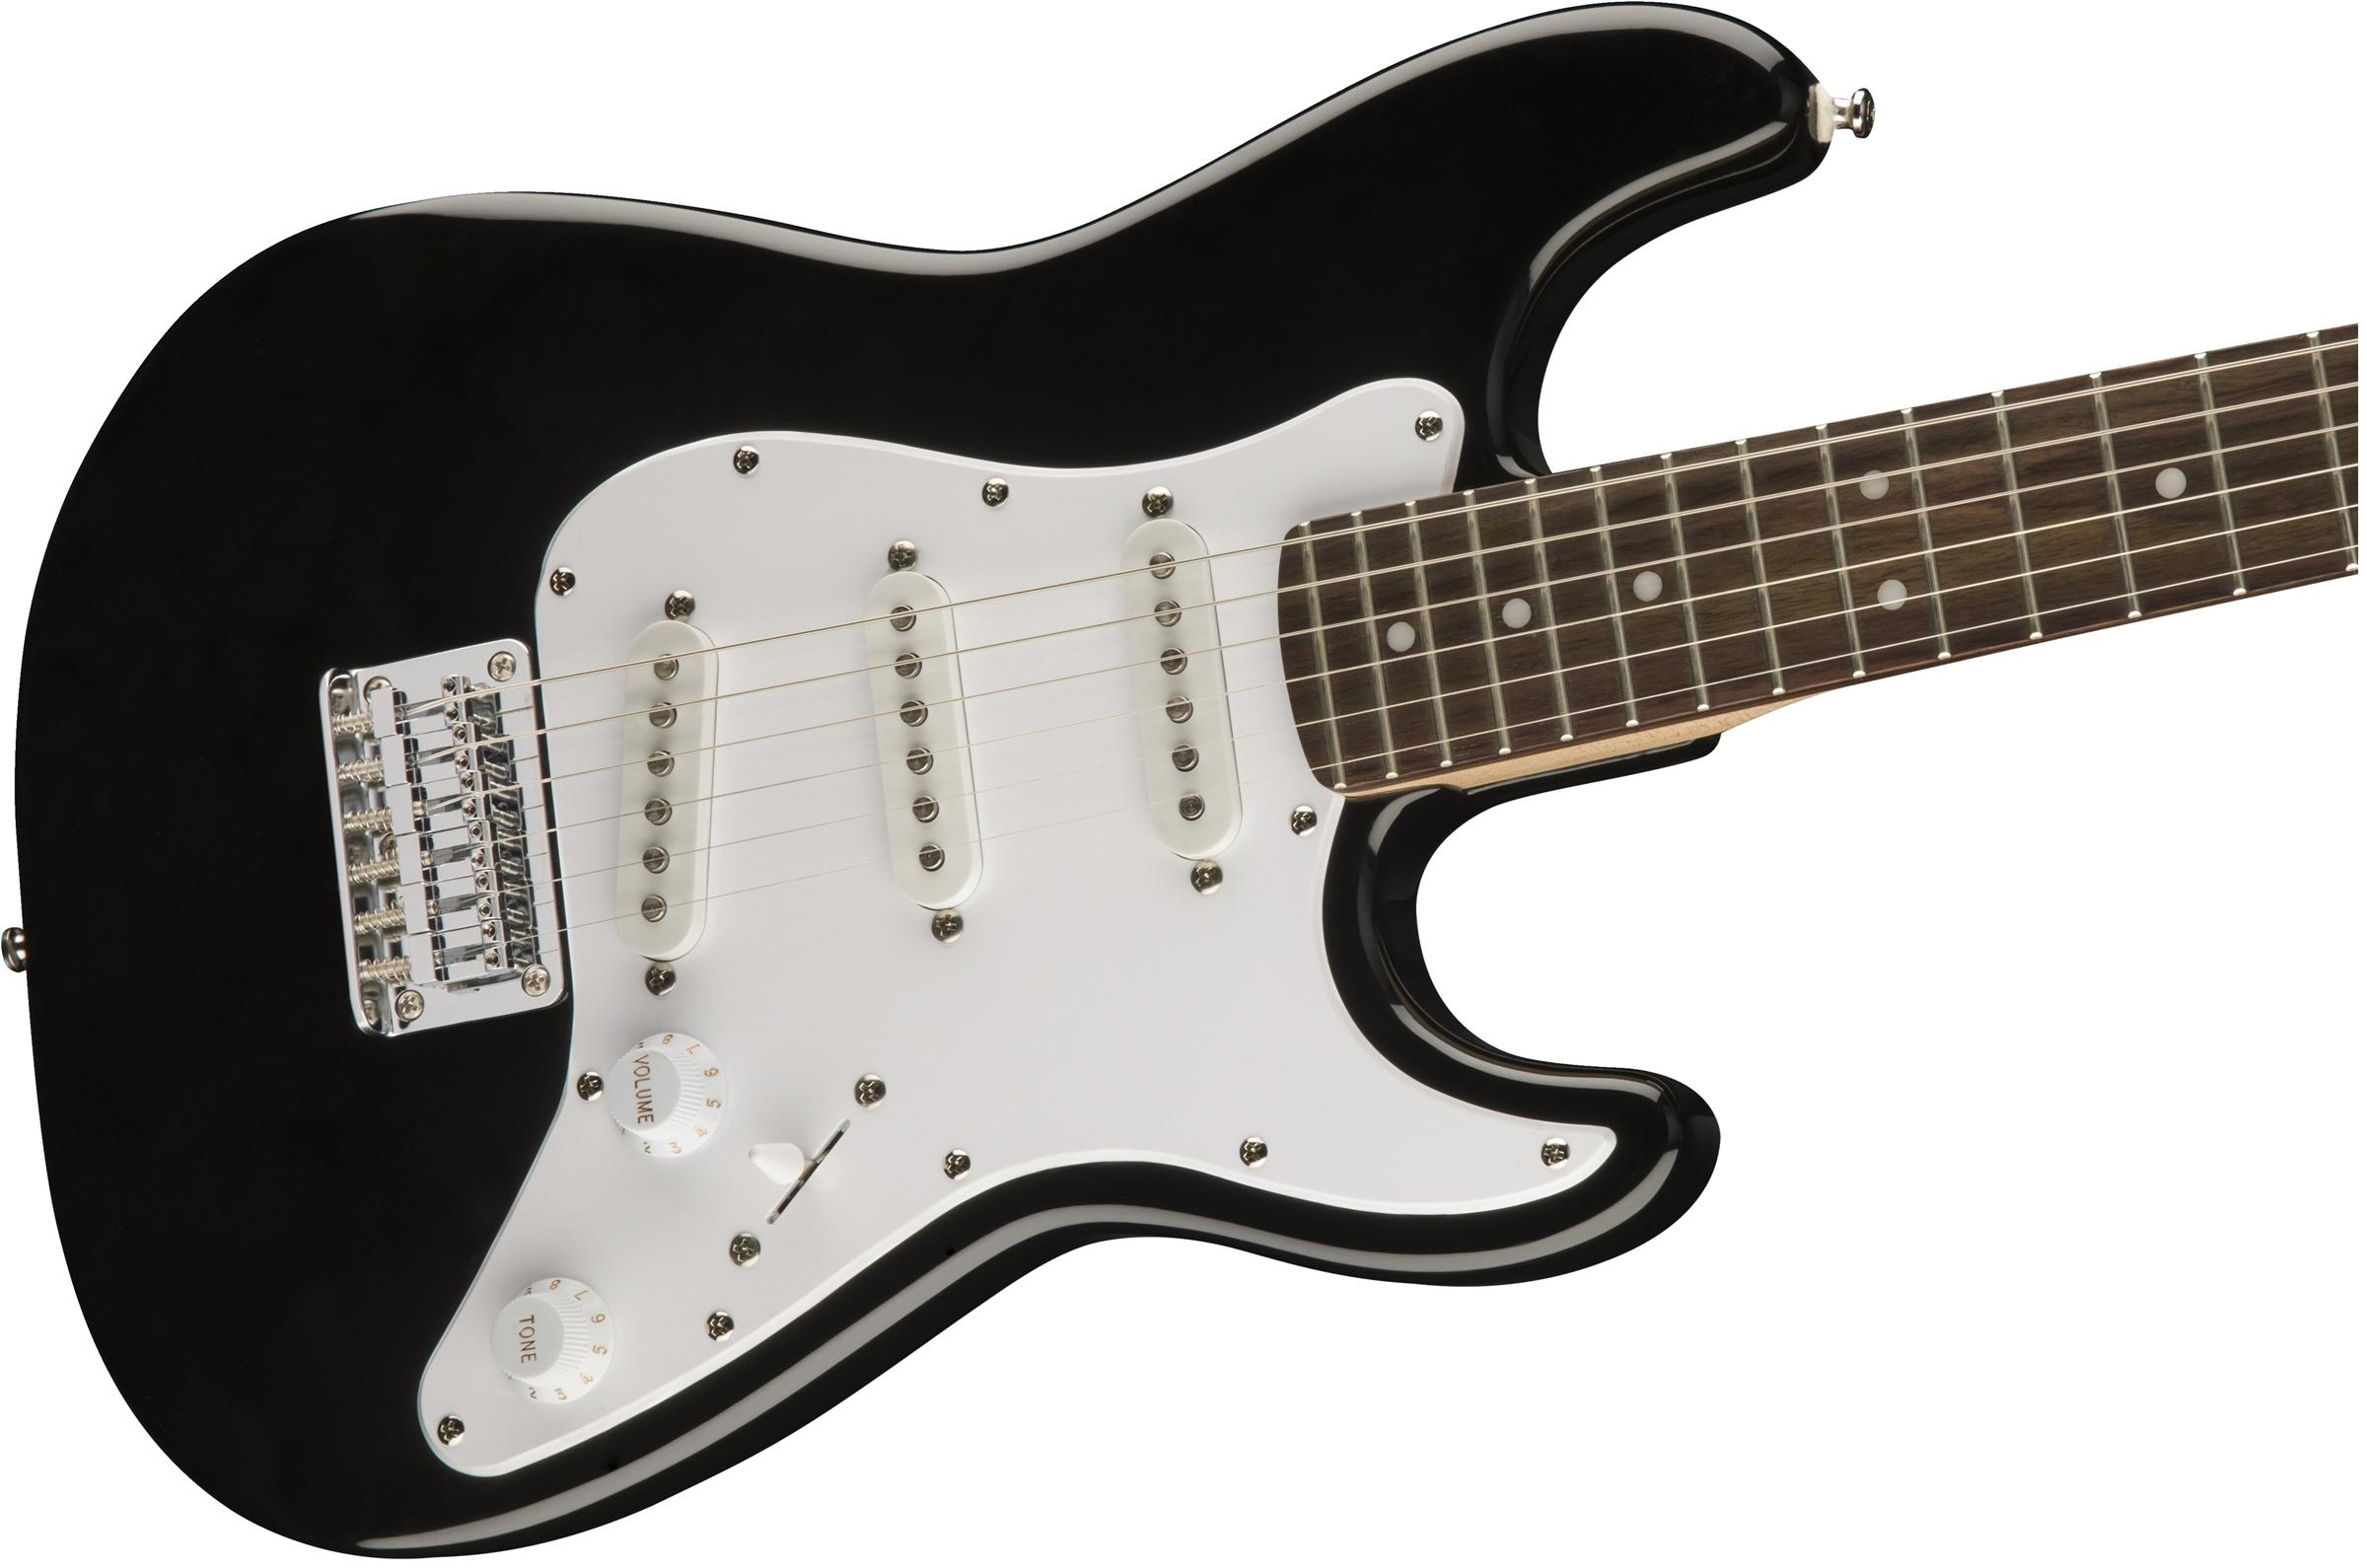 mini squier electric guitars. Black Bedroom Furniture Sets. Home Design Ideas